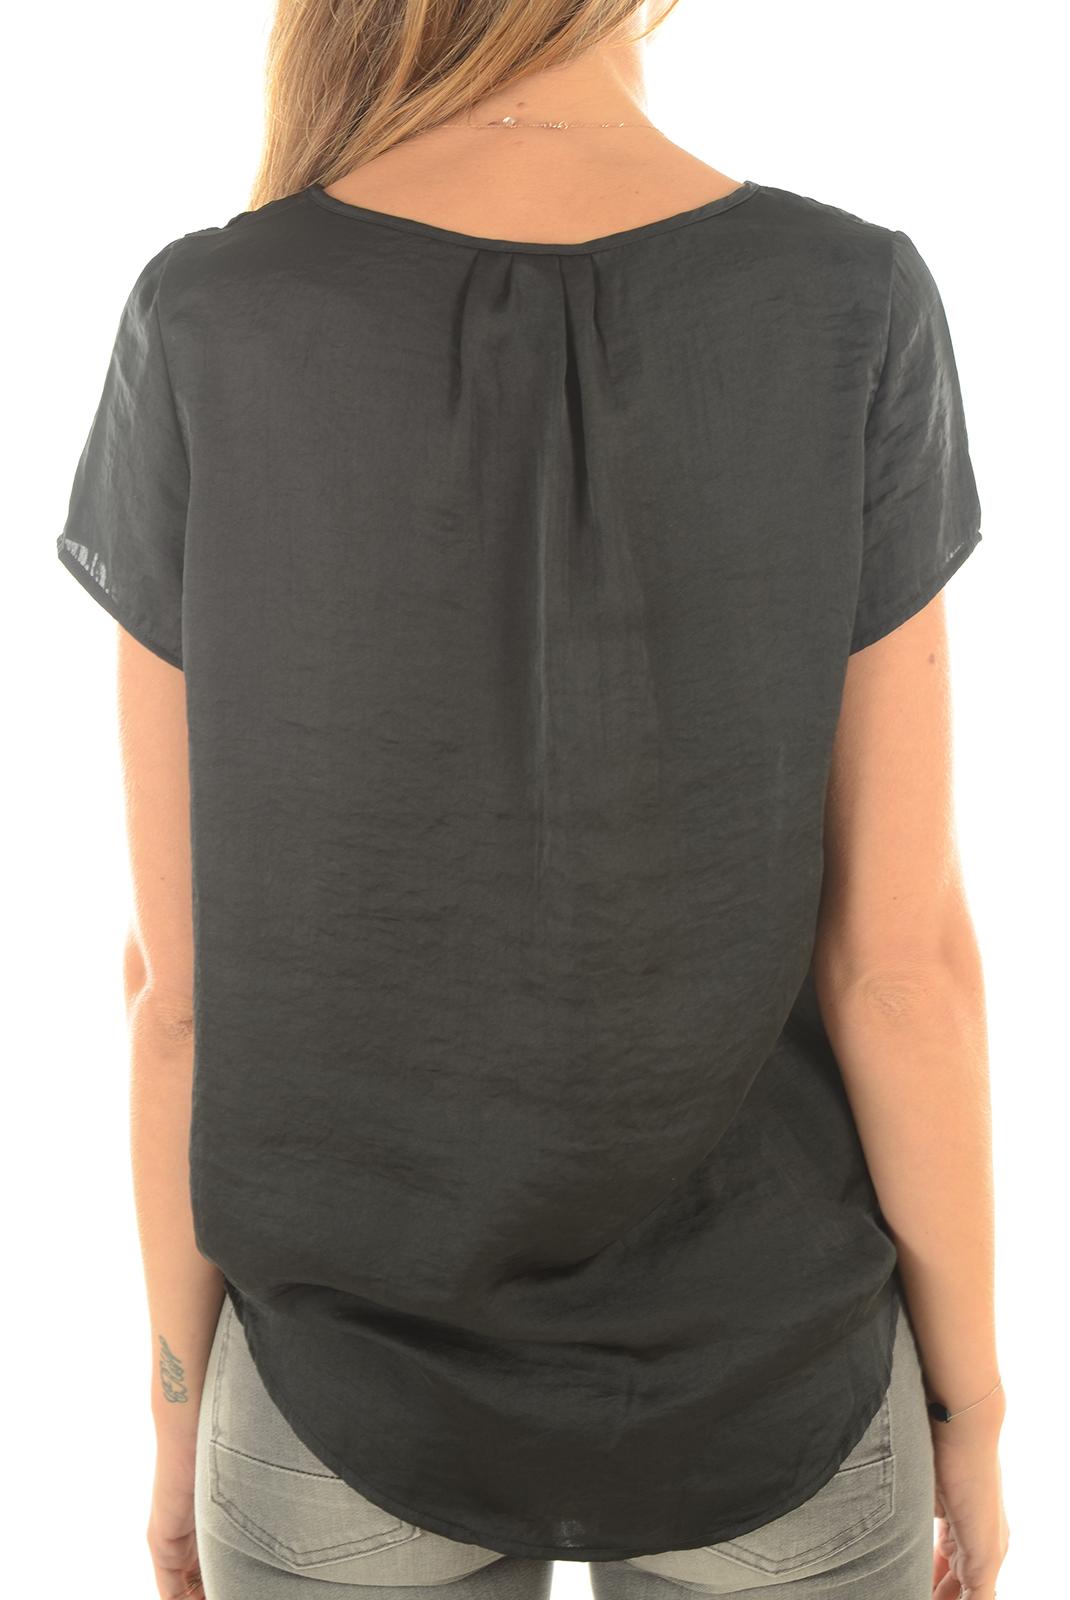 Tops & Tee shirts  Vero moda HAMMER CAP SLEEVE TOP BLACK